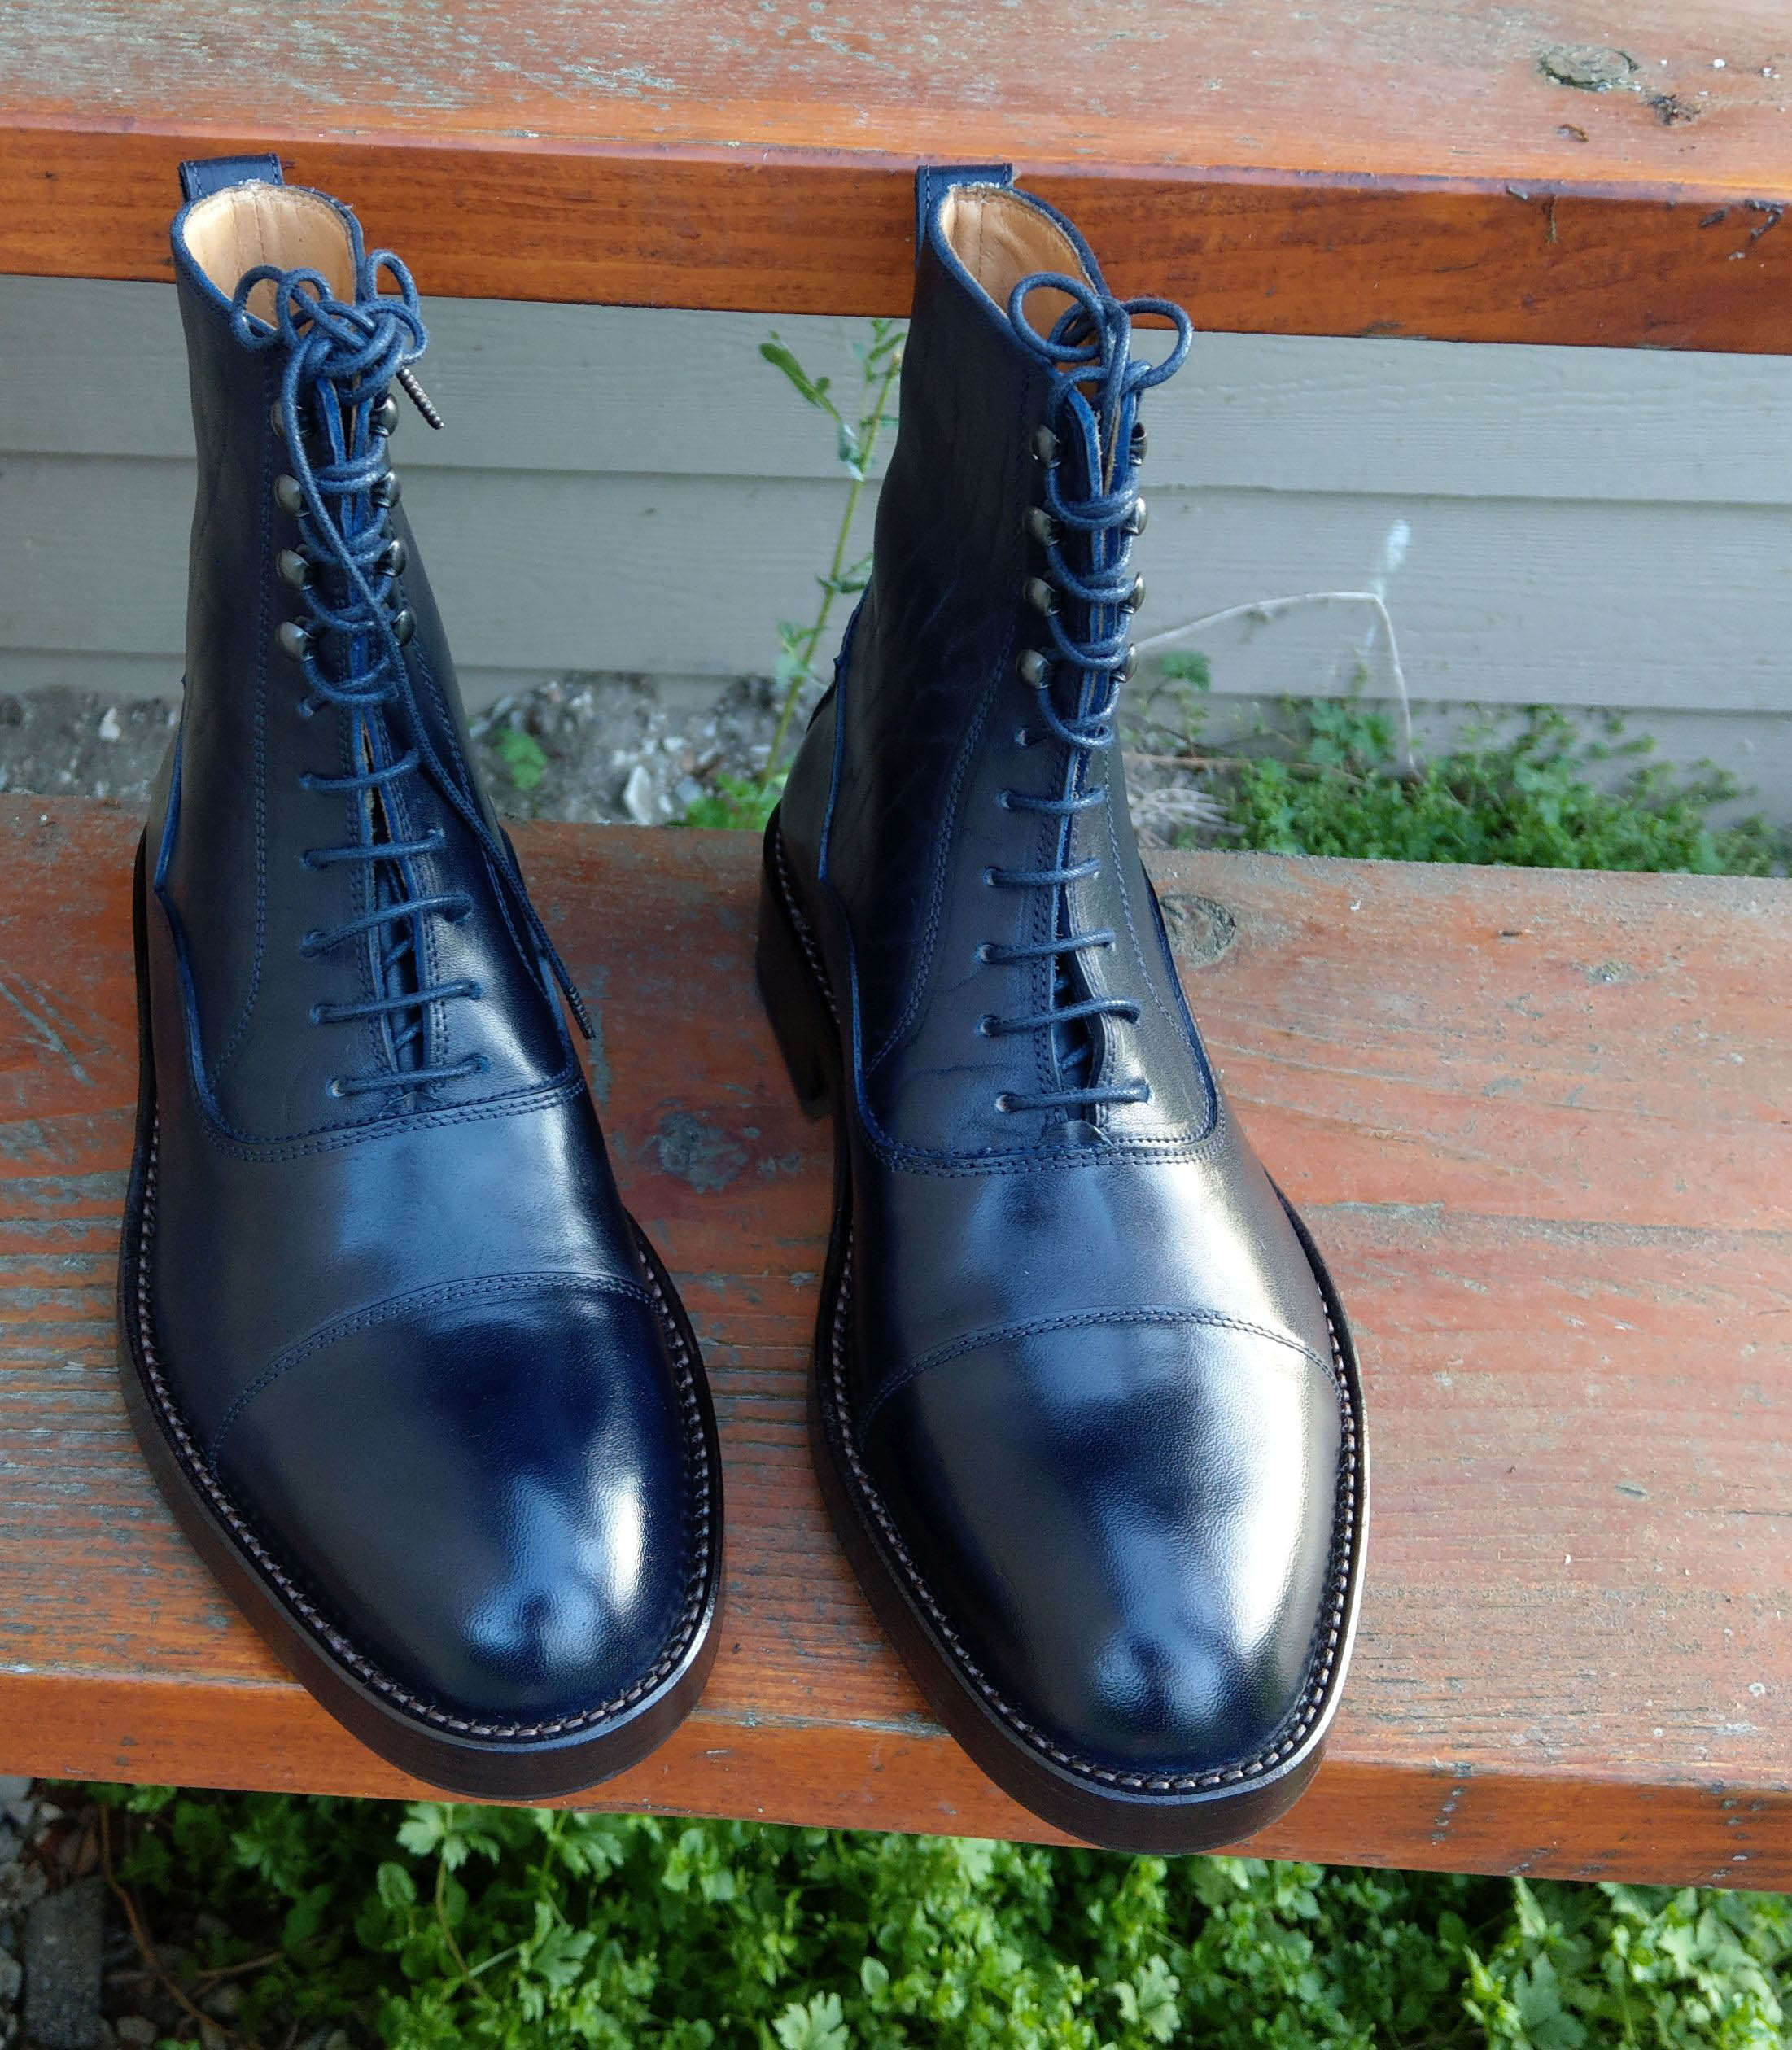 Navy-Horsehide-Balmoral-Boots-008.jpg